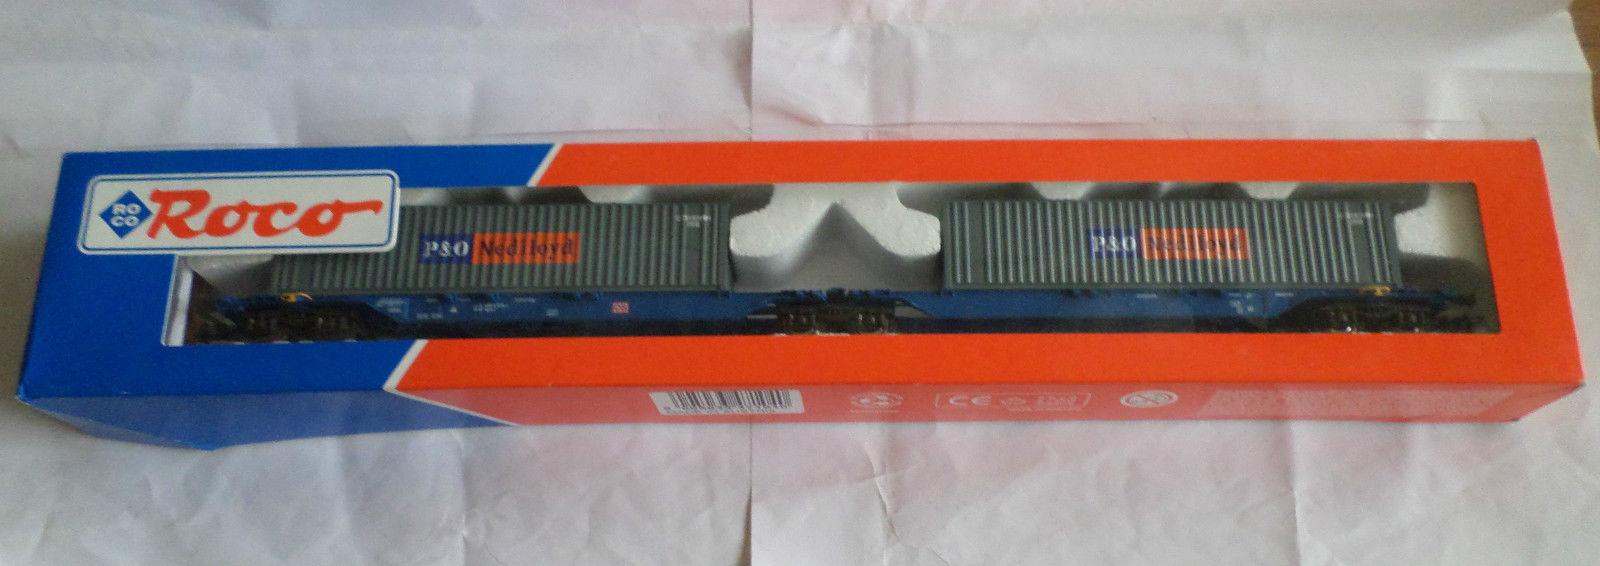 Roco 47104 - SOS 2001 VEDES, Doppeltragwageneinheit, 2-2-2-achsig, blau, DB AG Keks, Ladung 2 x 40' Container ' P&O Nedlloyd ', dunkelgrau